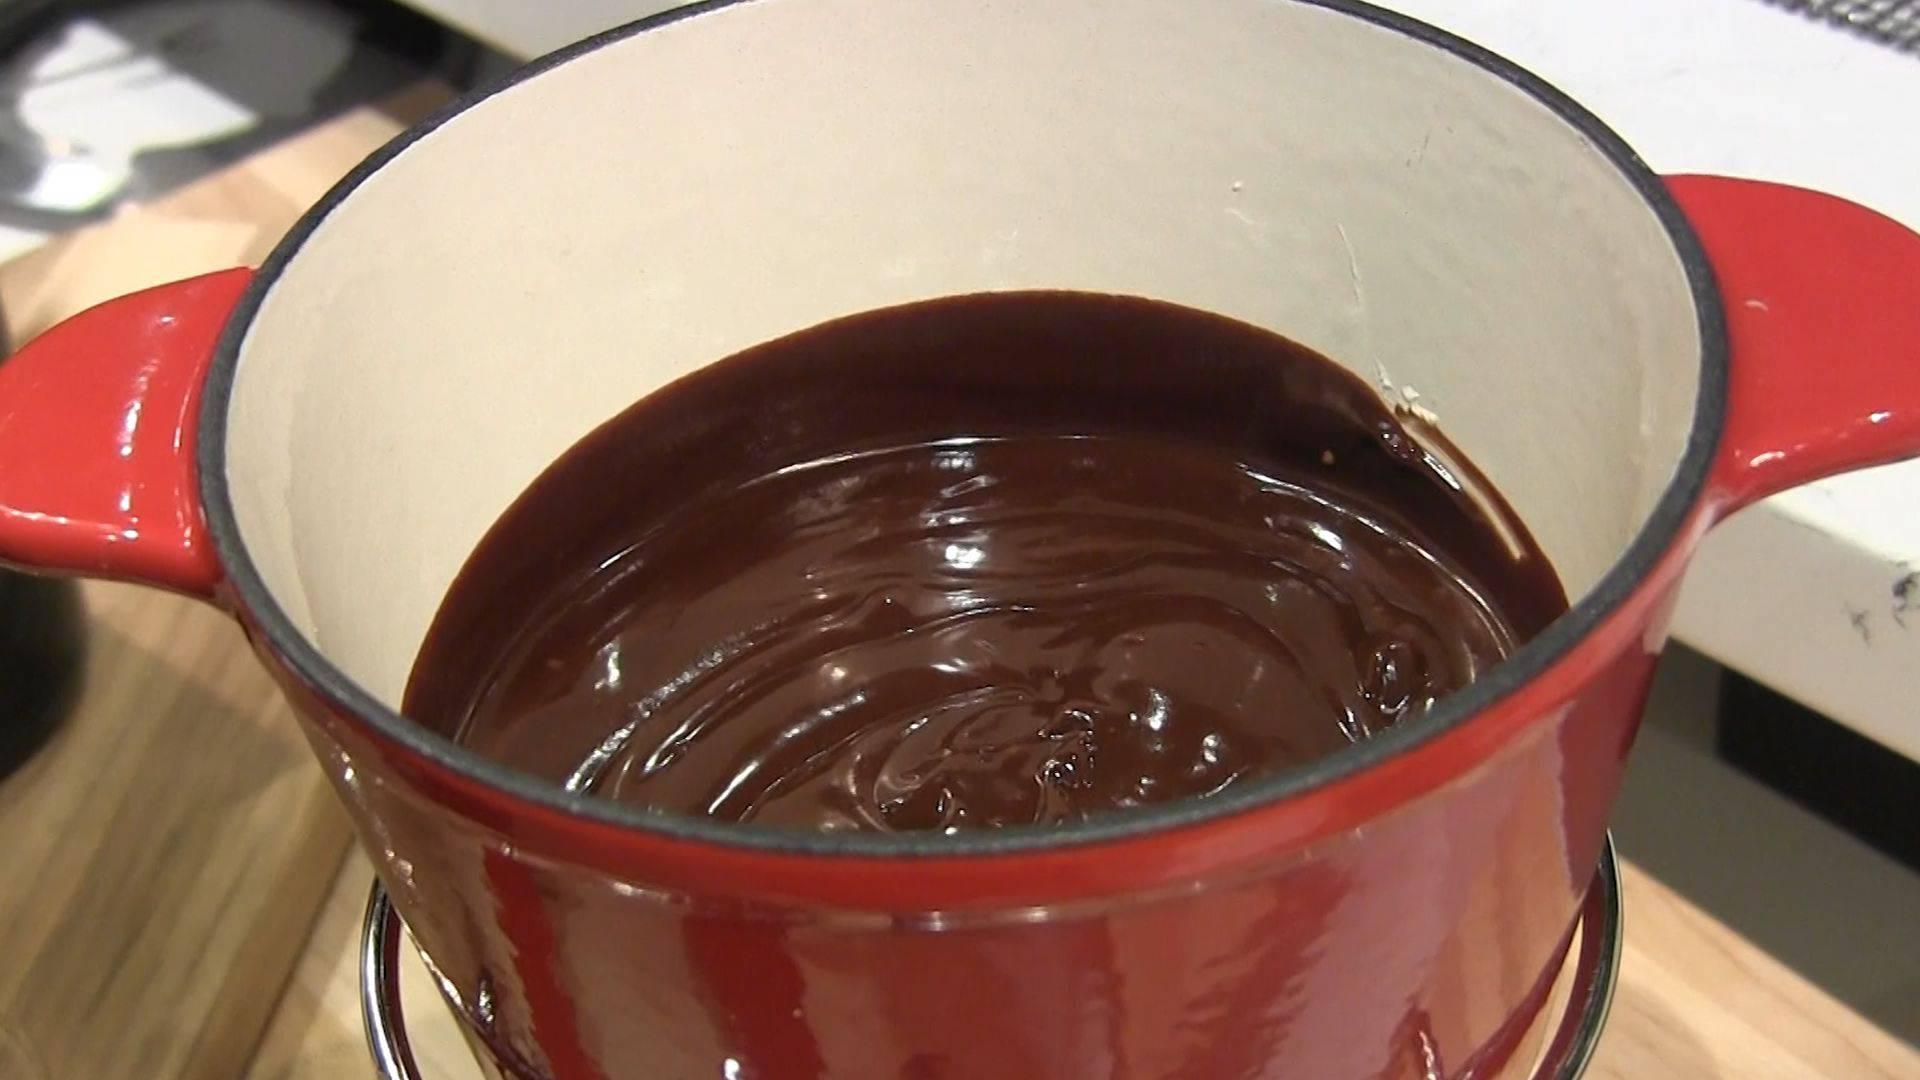 How to Make Easy Chocolate Fondue